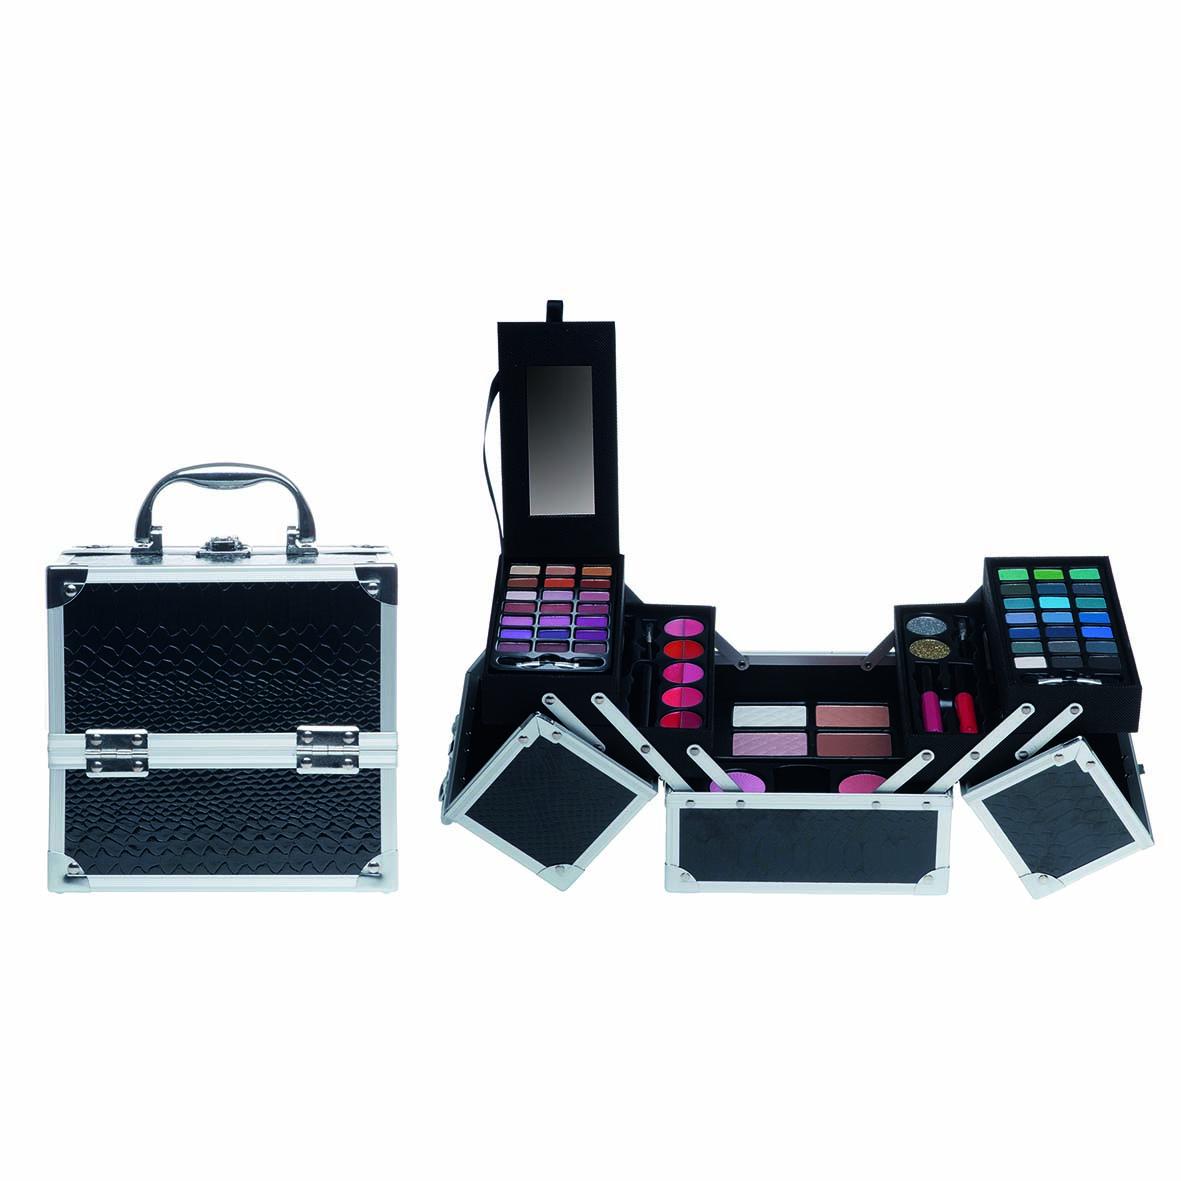 Afbeelding van Casuelle Make-up Koffer Vierkant Zwart Glans Krokodillenprint